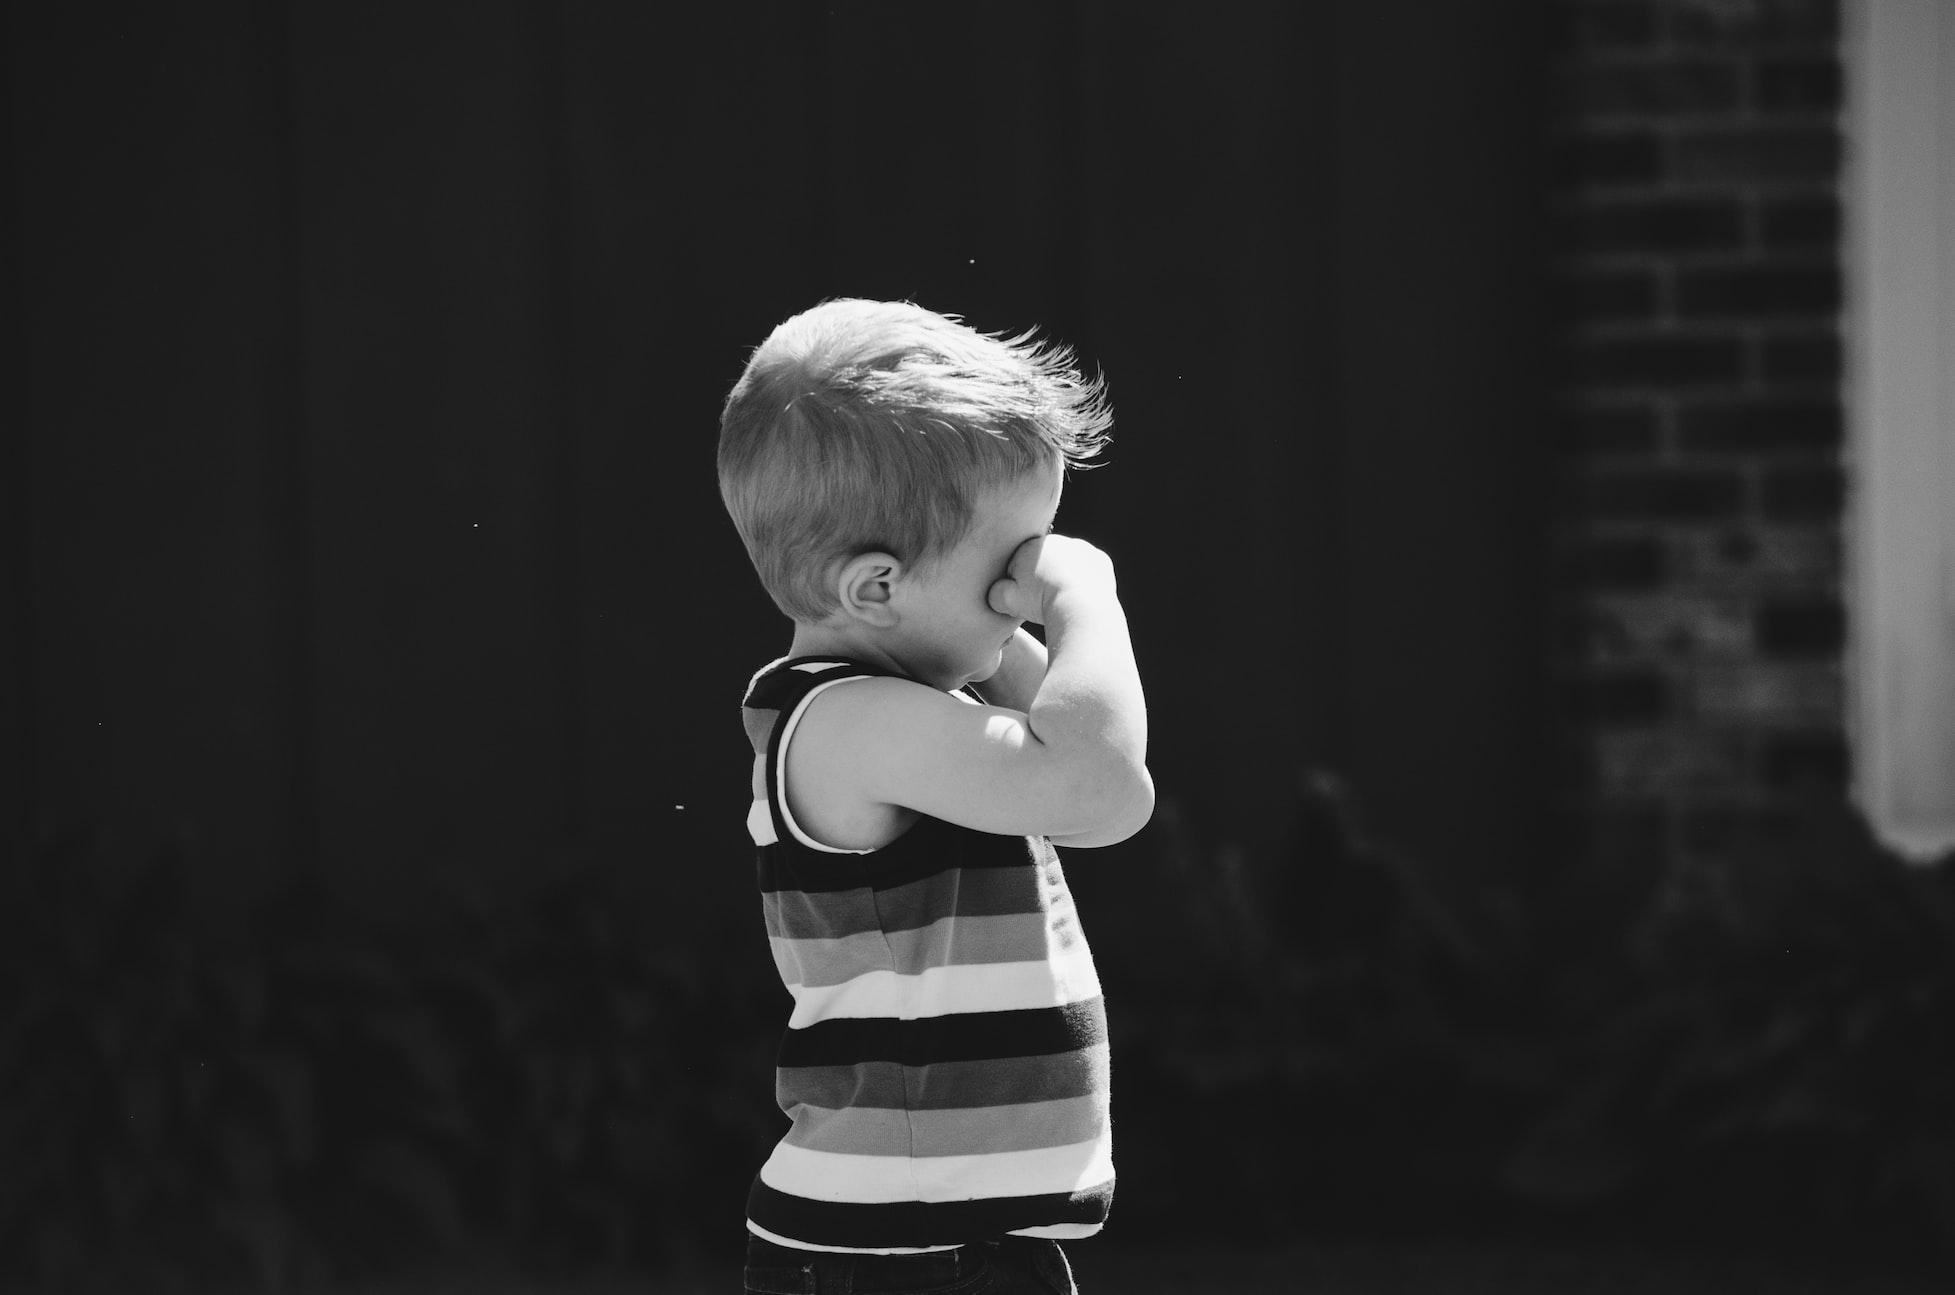 A Child